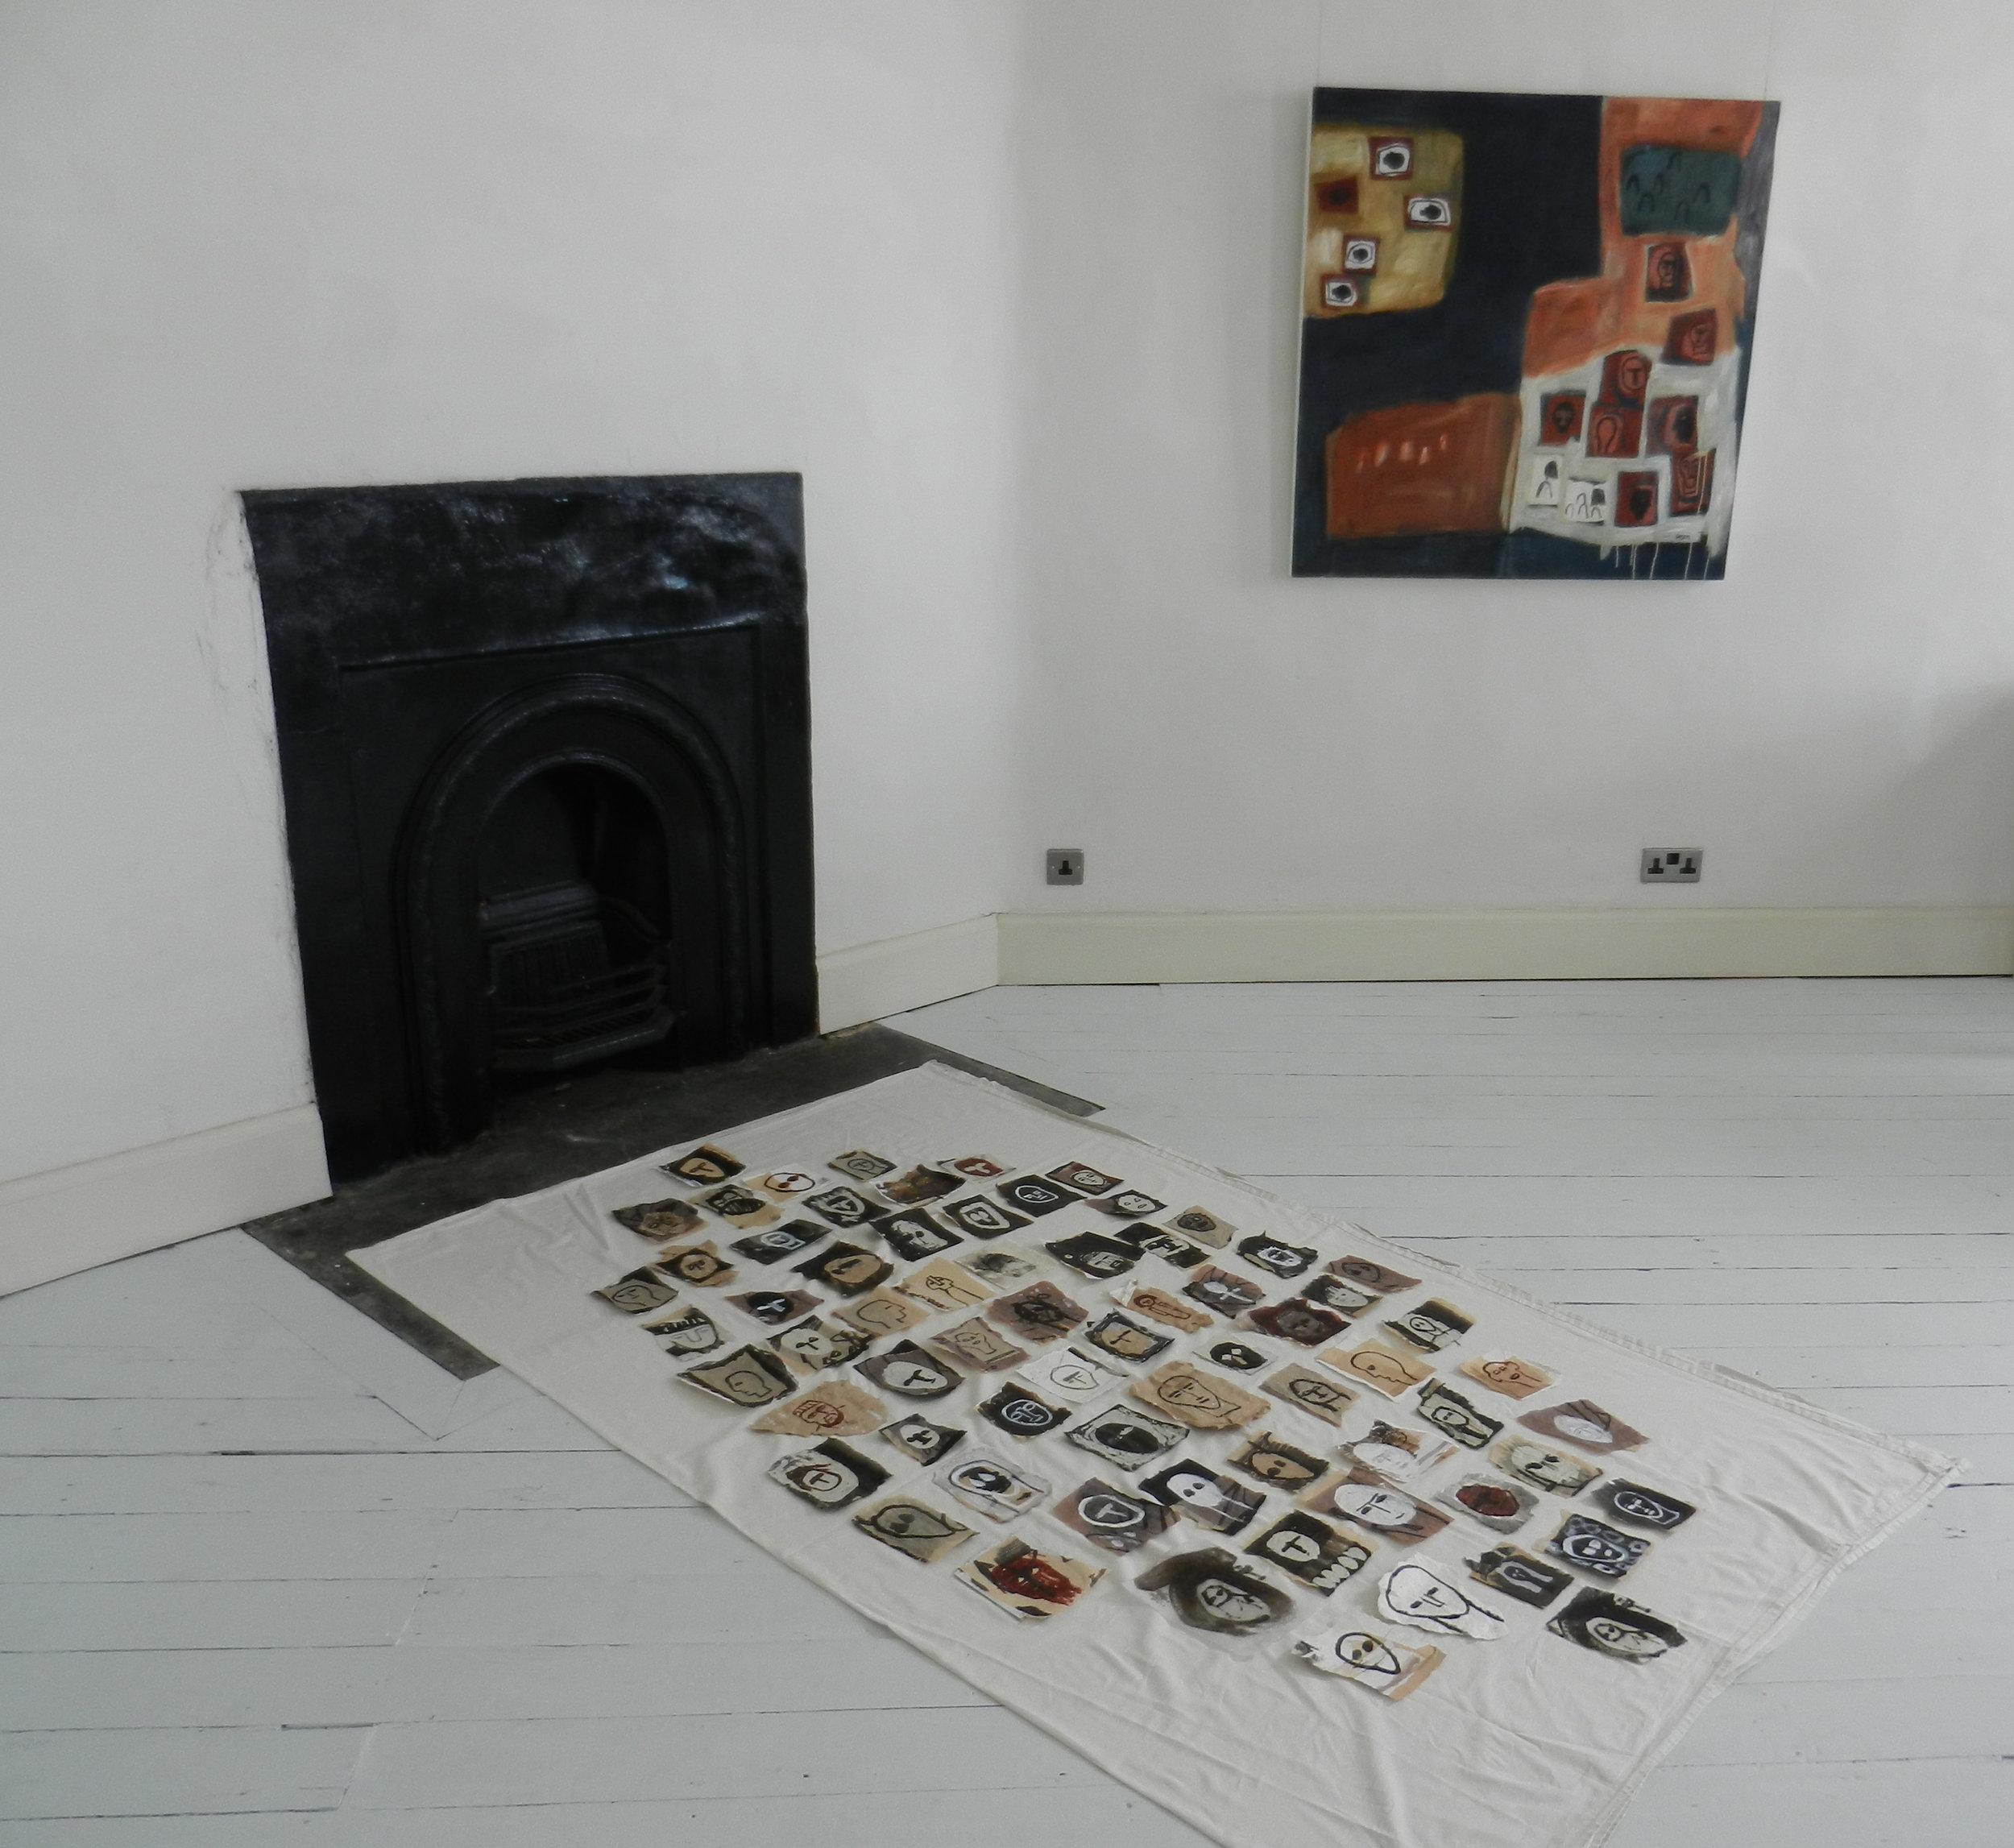 Installation, Damer House, Roscrea, 2019